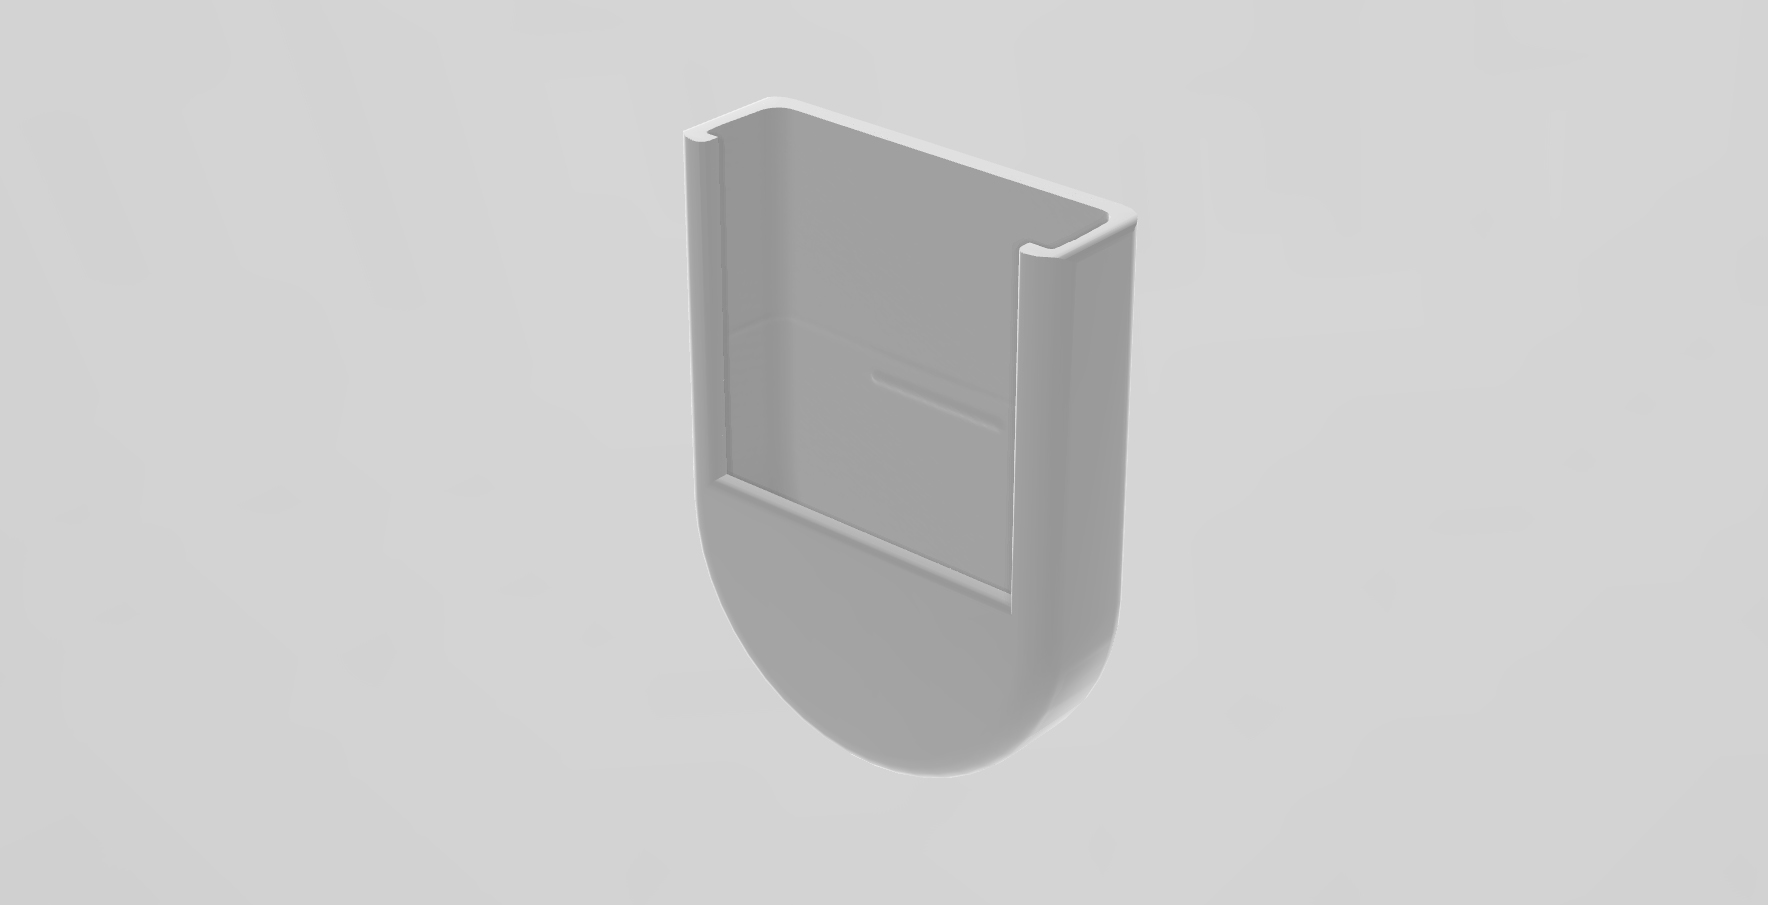 Solid Edge reverse engineering